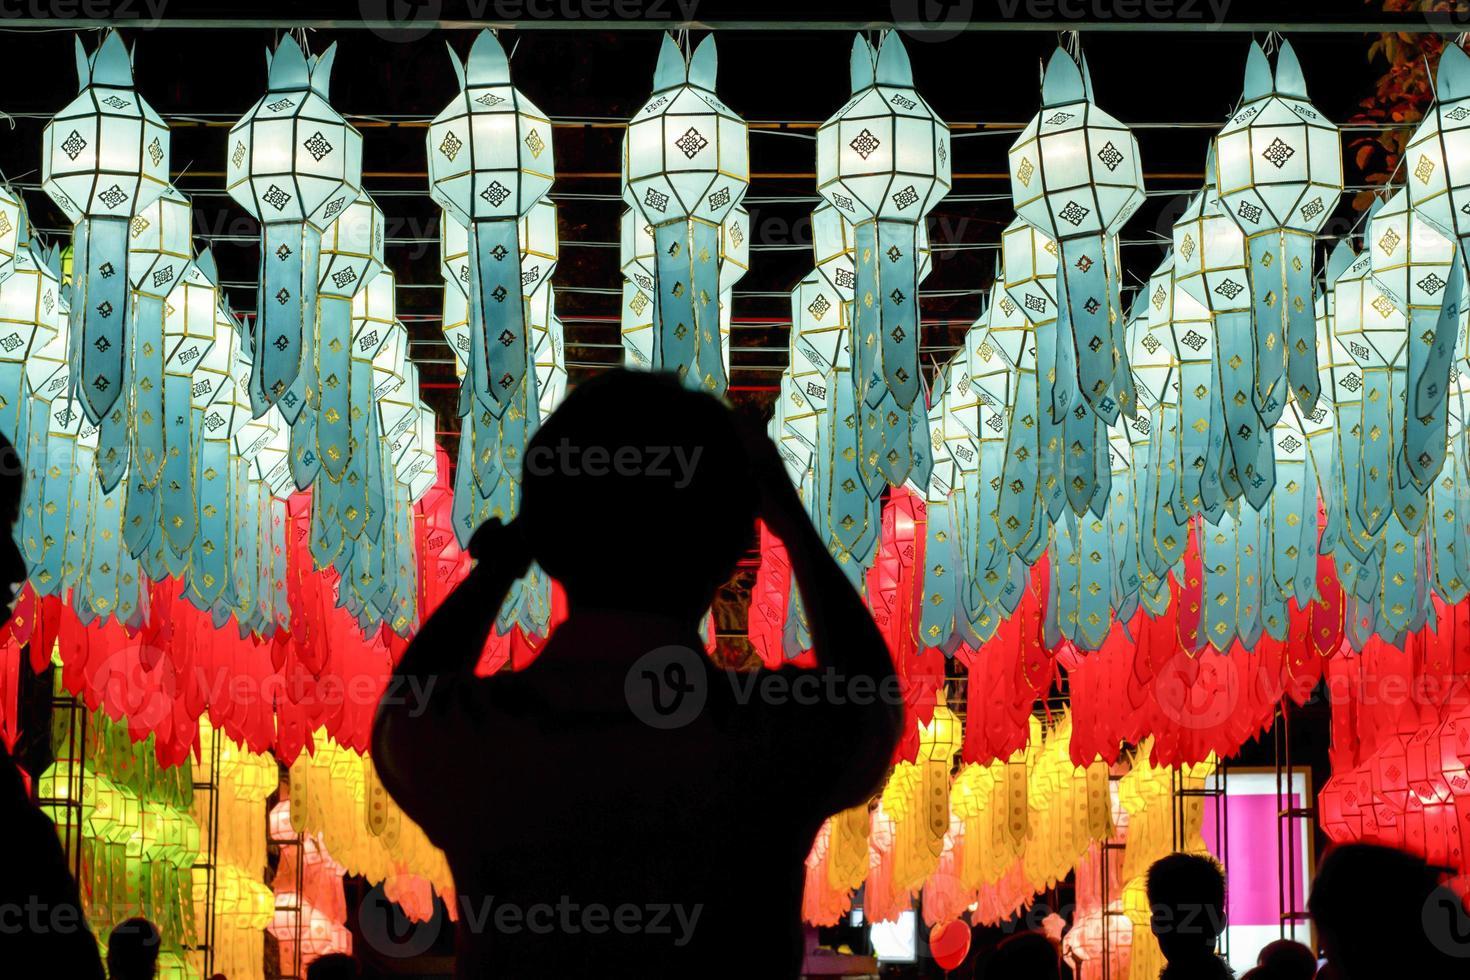 lanternas de papel no festival yee-peng, chiangmai Tailândia foto